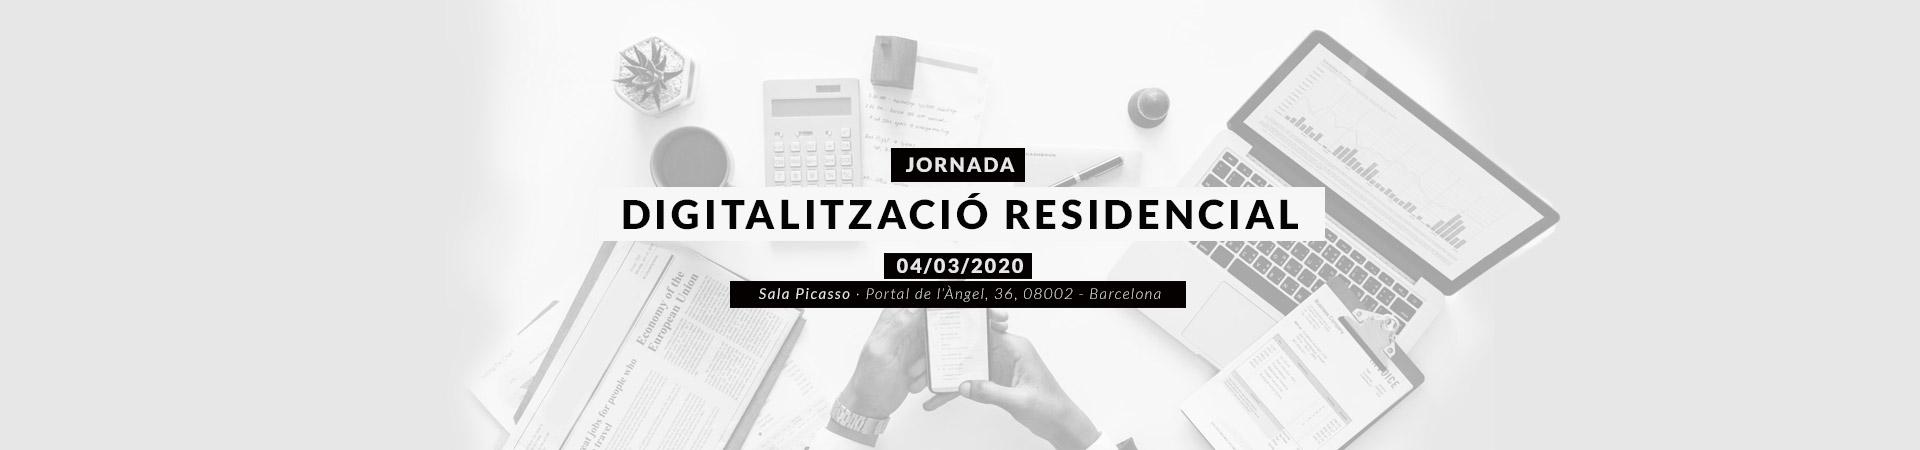 Slide-JornadaDigitalizacionResidencial-202003-ca